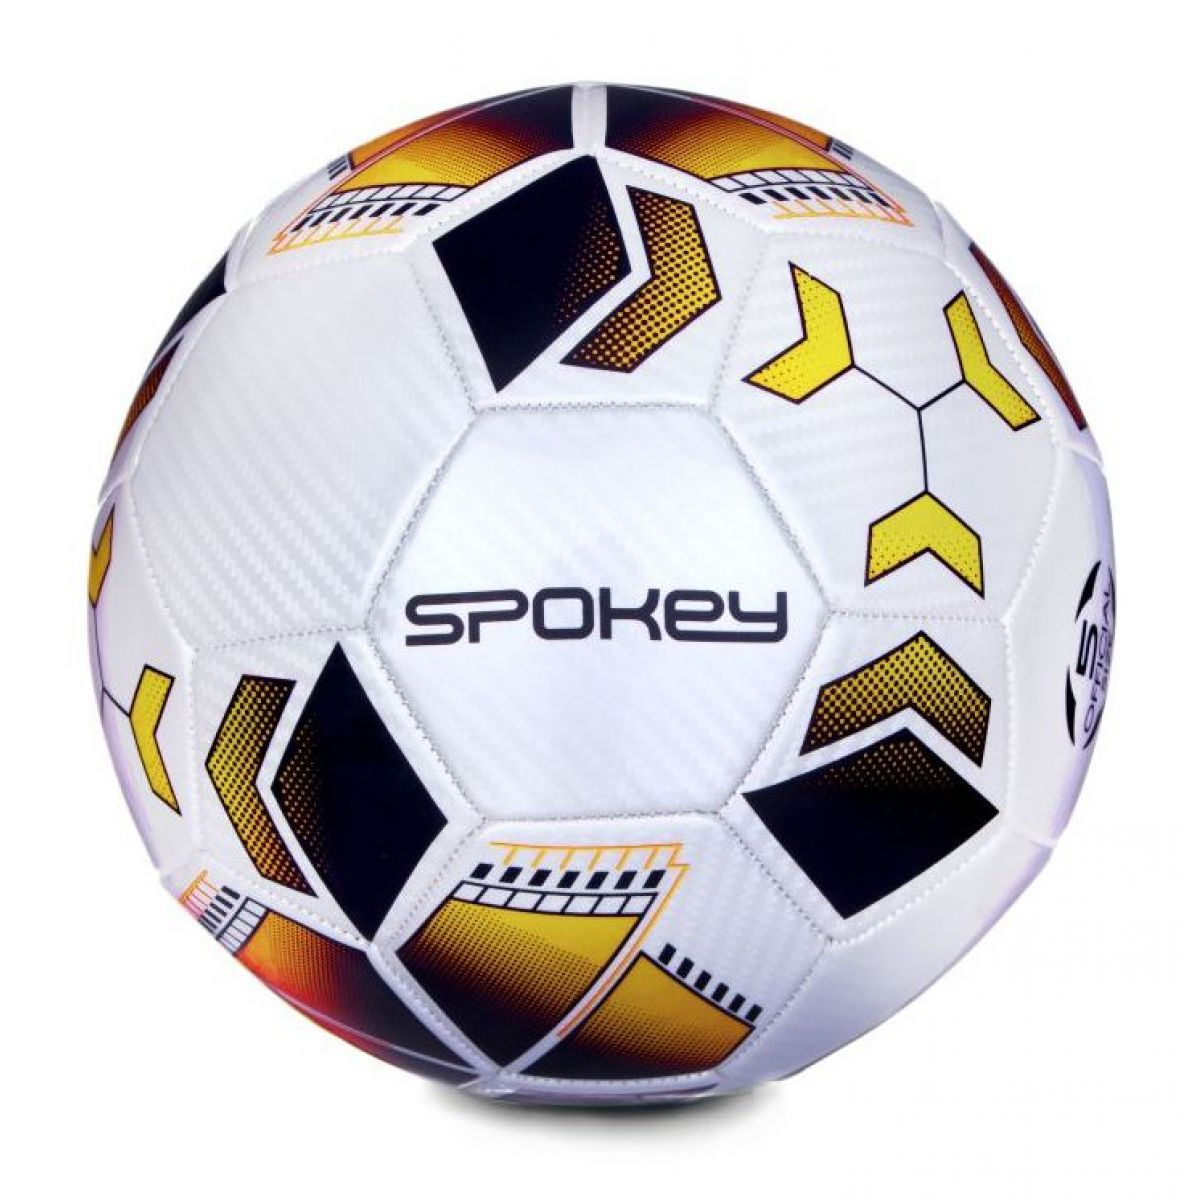 Spokey Agilit fotbalový míč vel.5 černo-oranžový